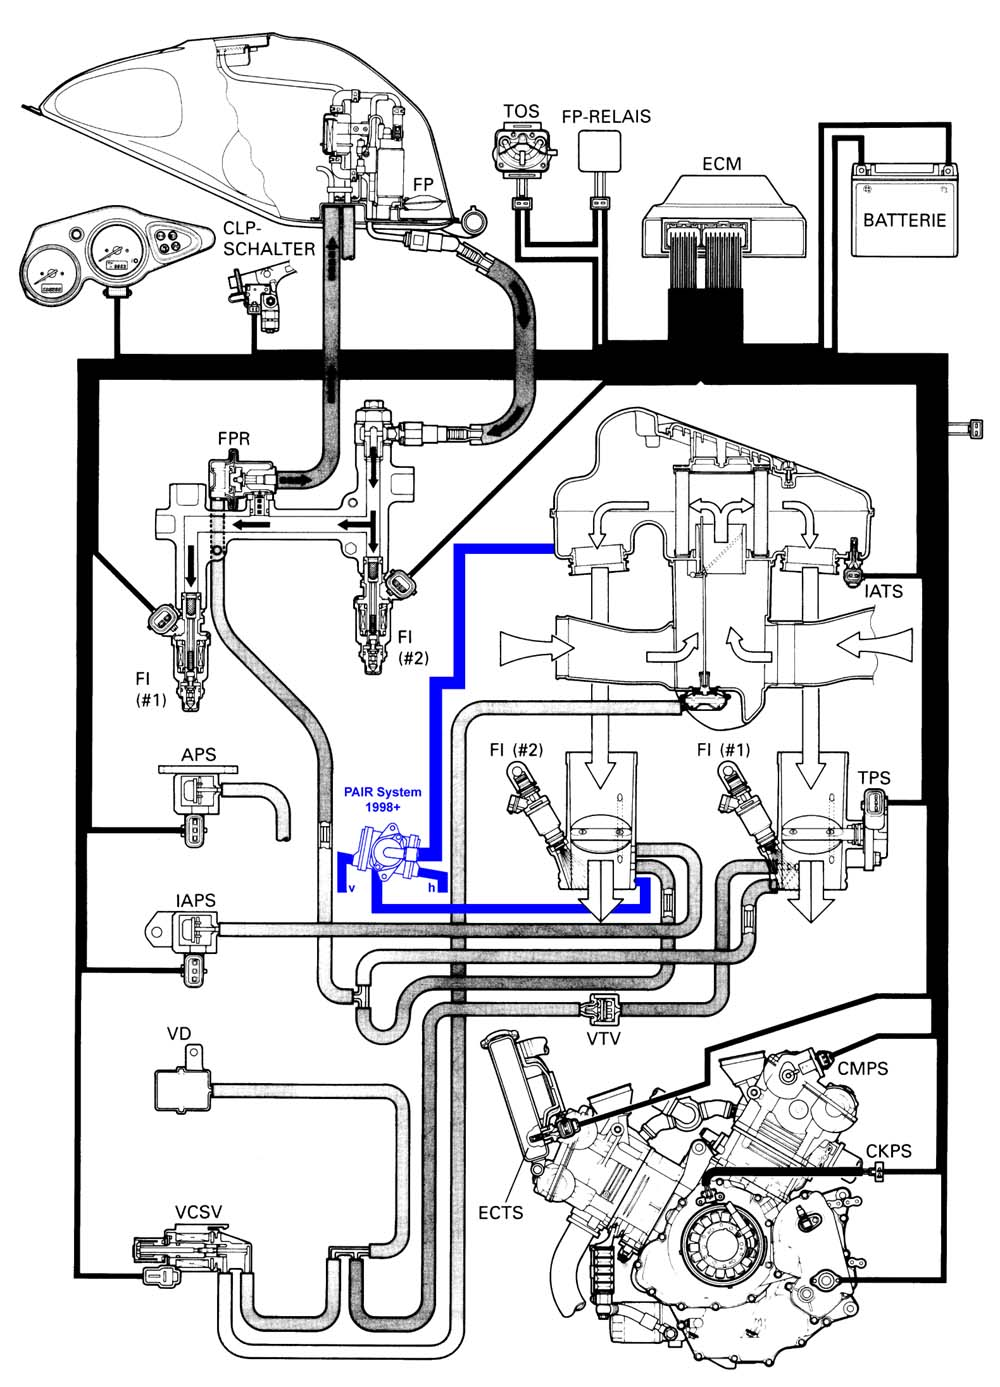 Tl1000r Wiring Diagram 2001 Suzuki Gsxr 1000 Pair Valve Removal Rh Tlmods Com Tl1000s